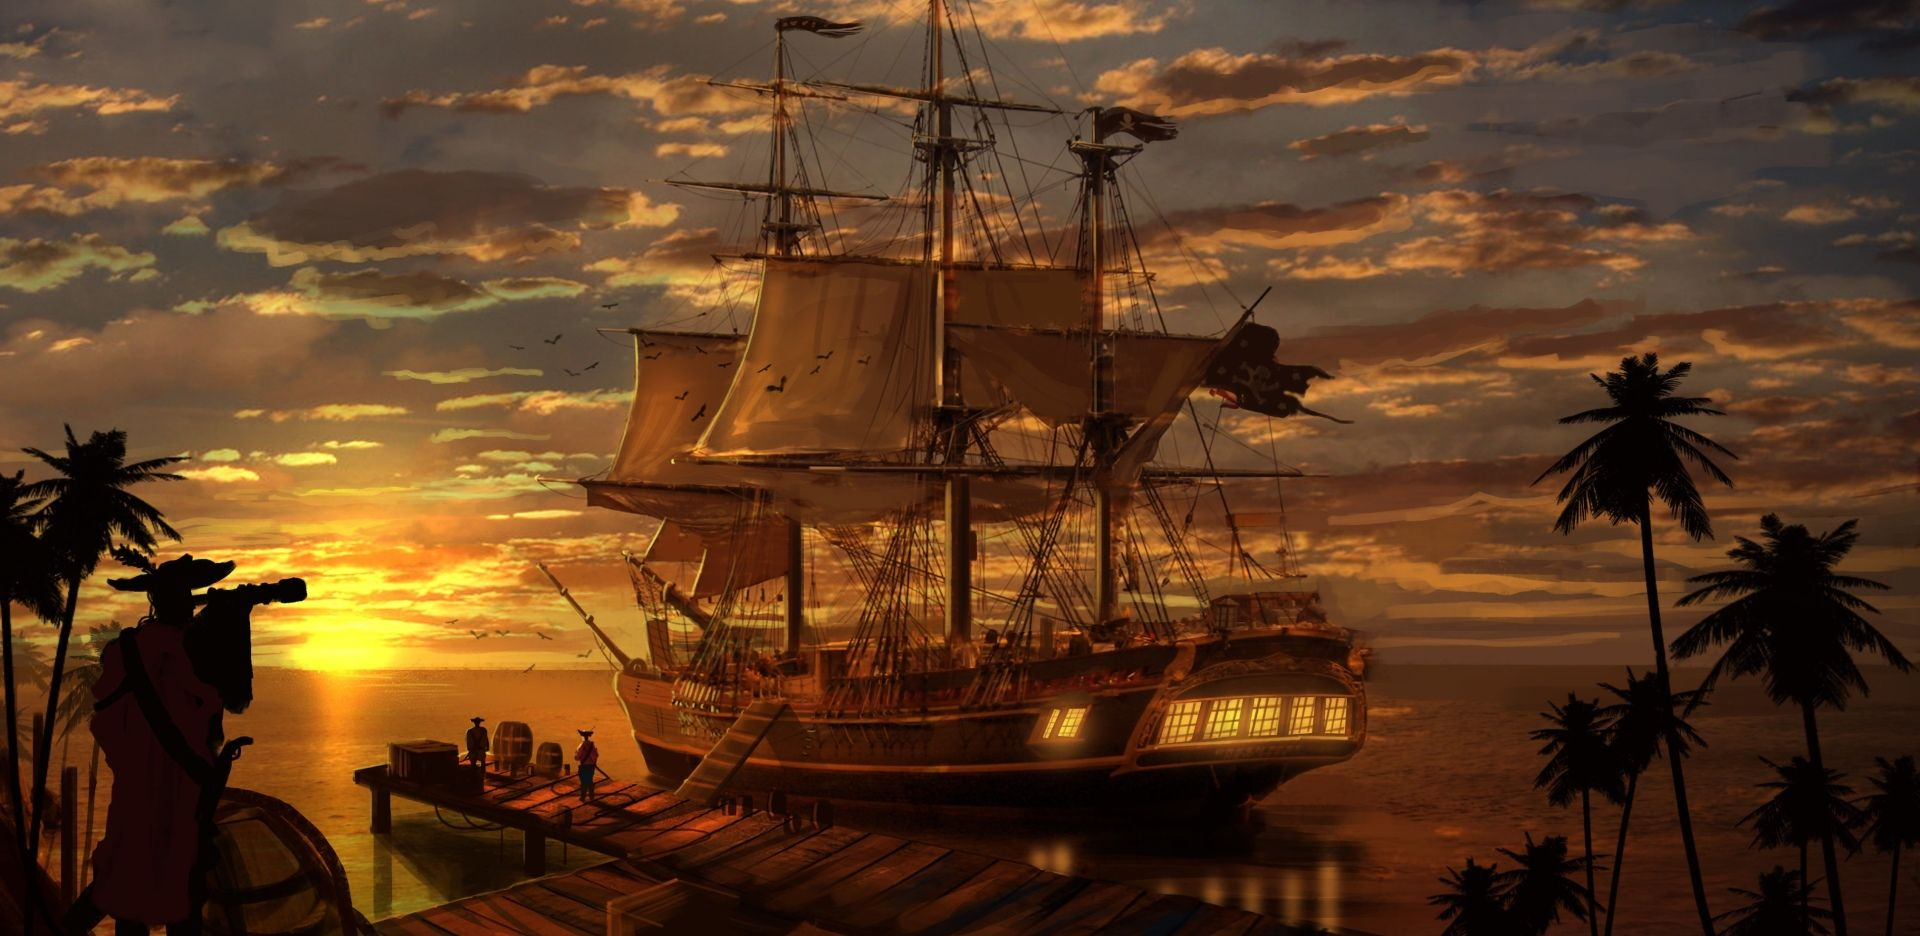 fantasy ship dock loading departure pirate ship pirate pier sunset